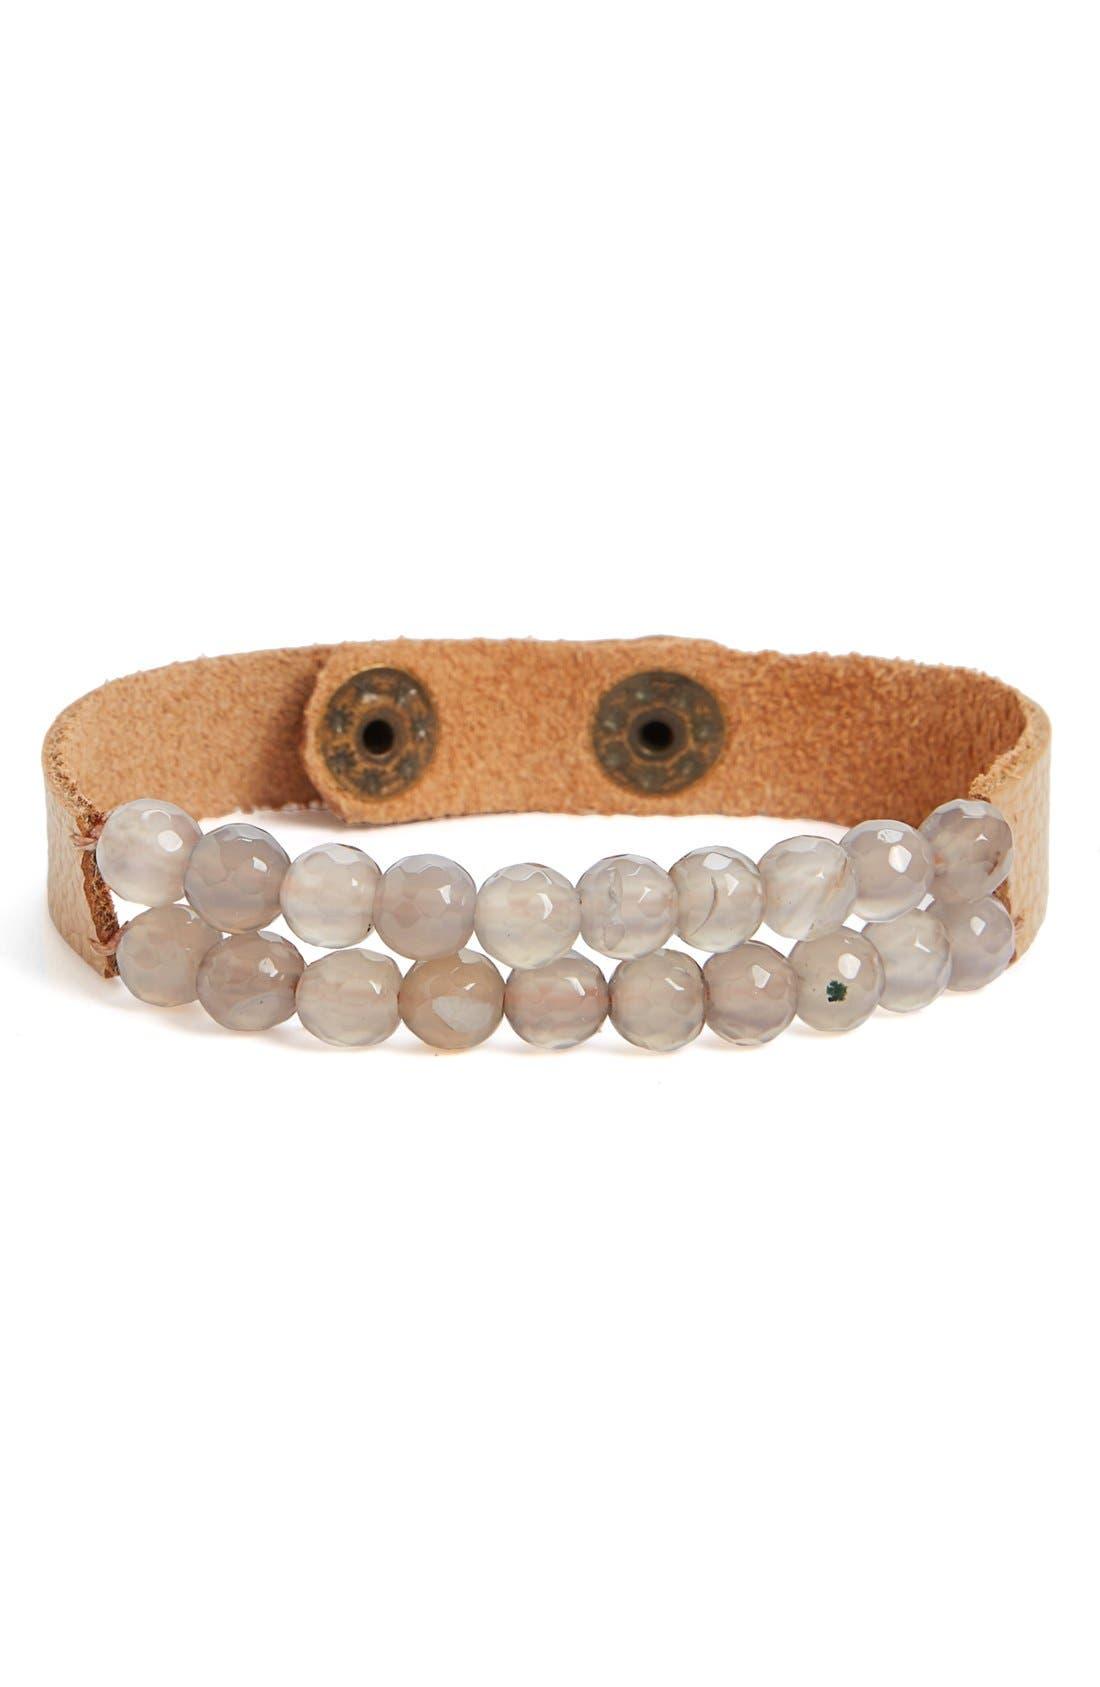 Main Image - Panacea Beige Beaded Leather Bracelet